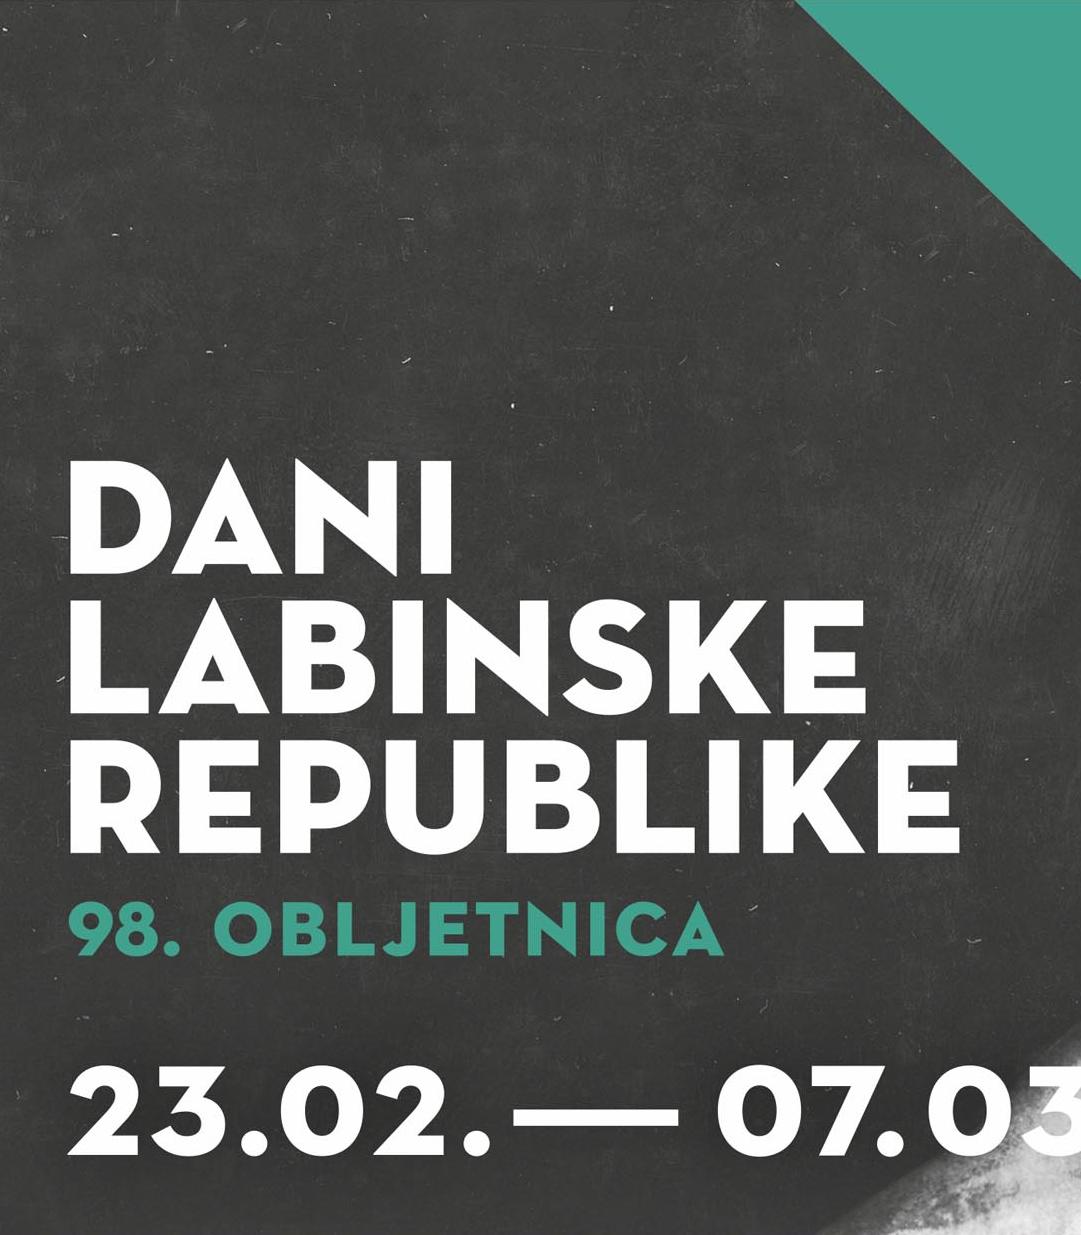 98. obljetnica Dana Labinske republike